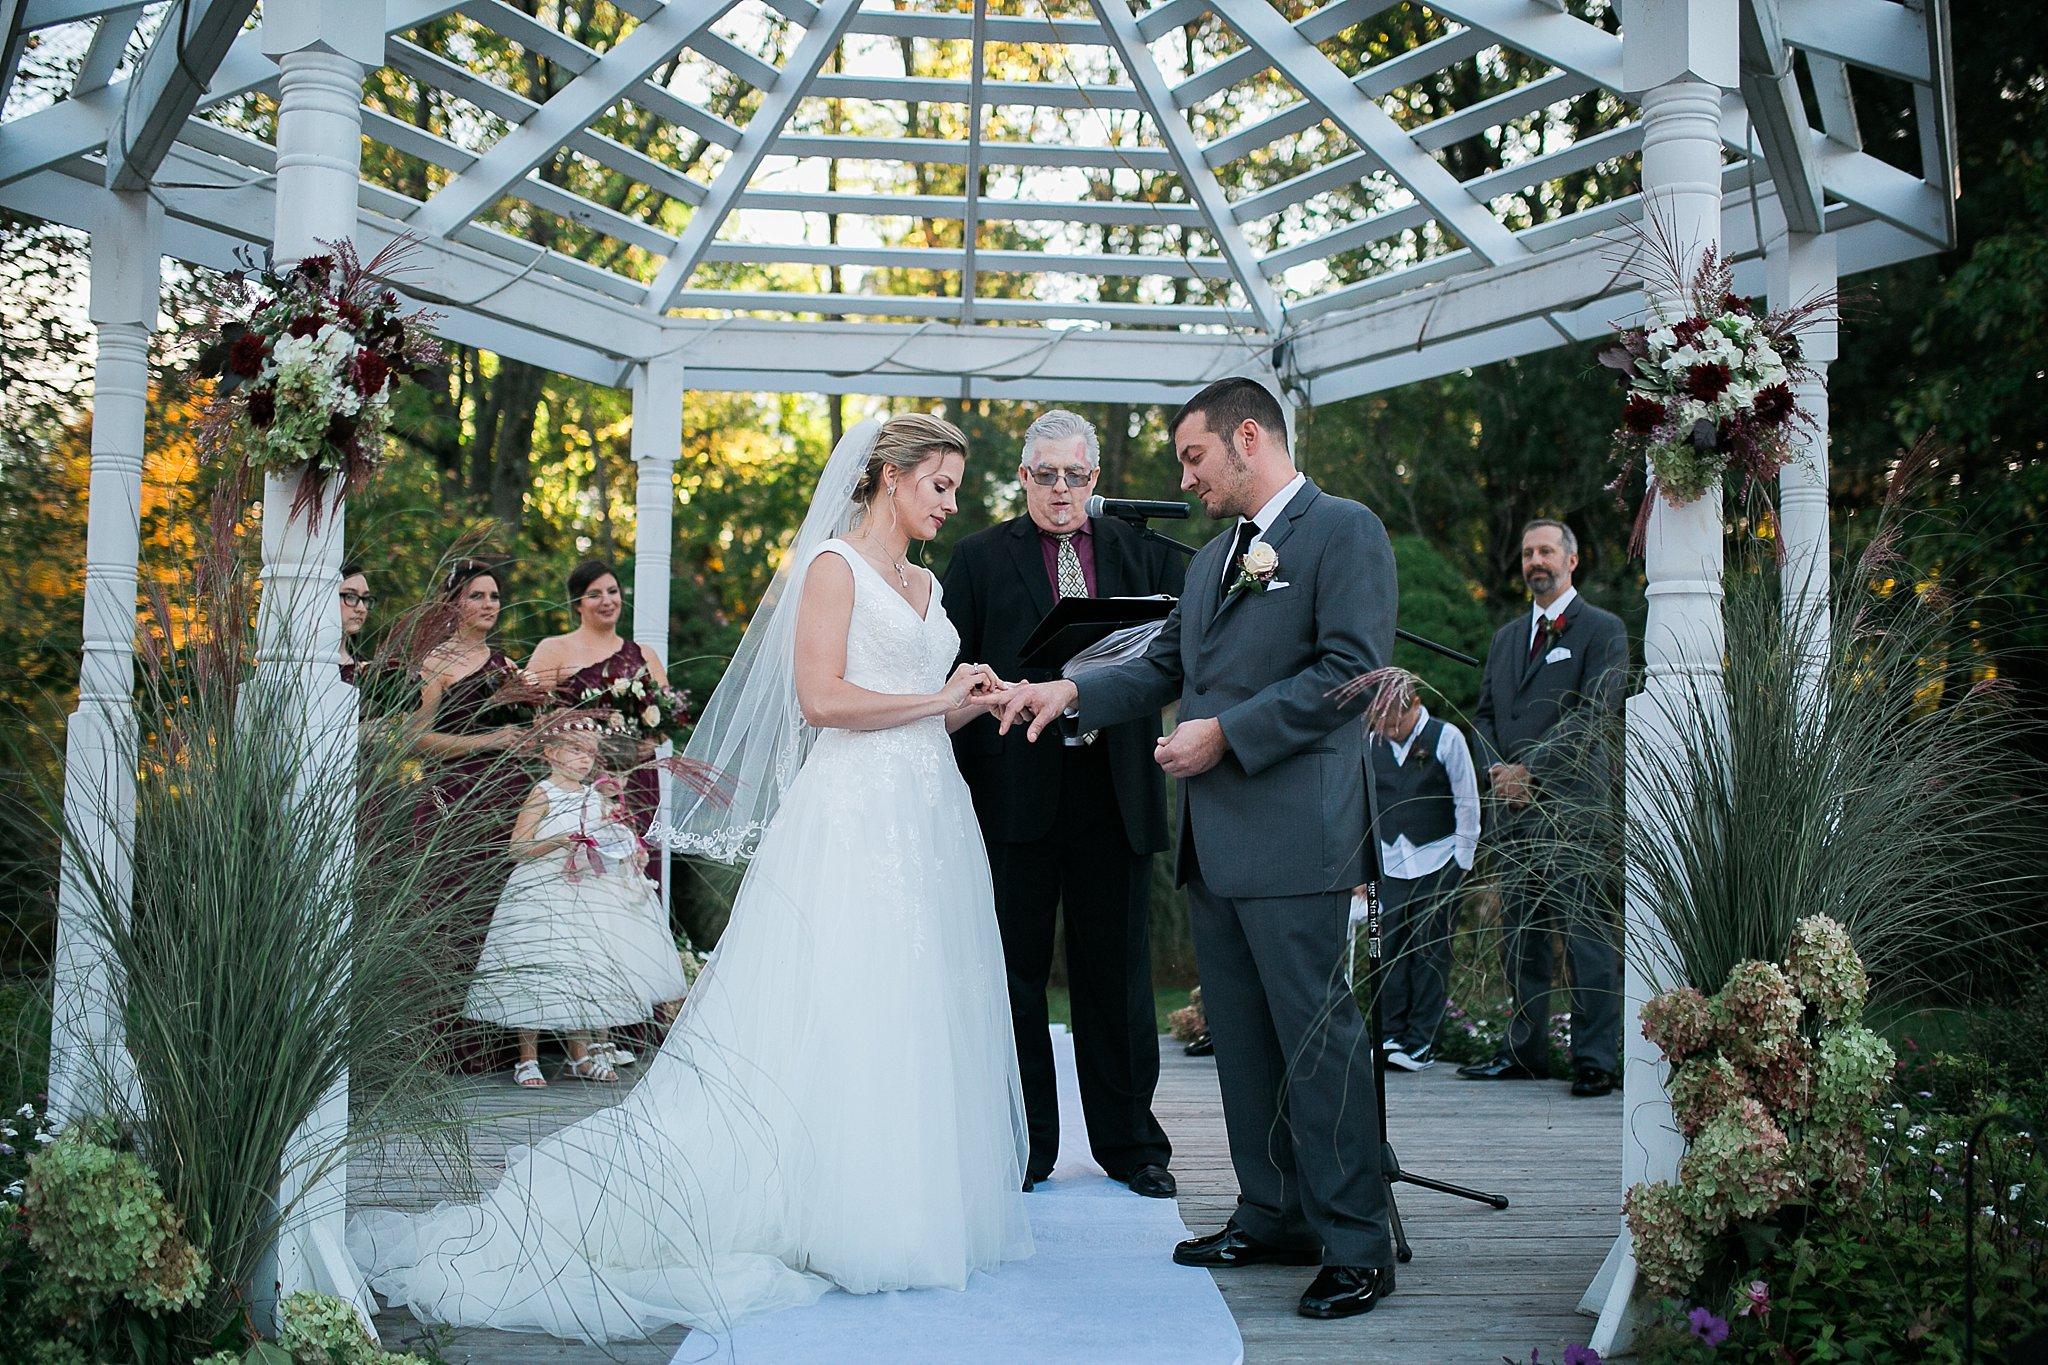 New Windsor New York Hudson Valley New York Wedding Photographer 45.jpg